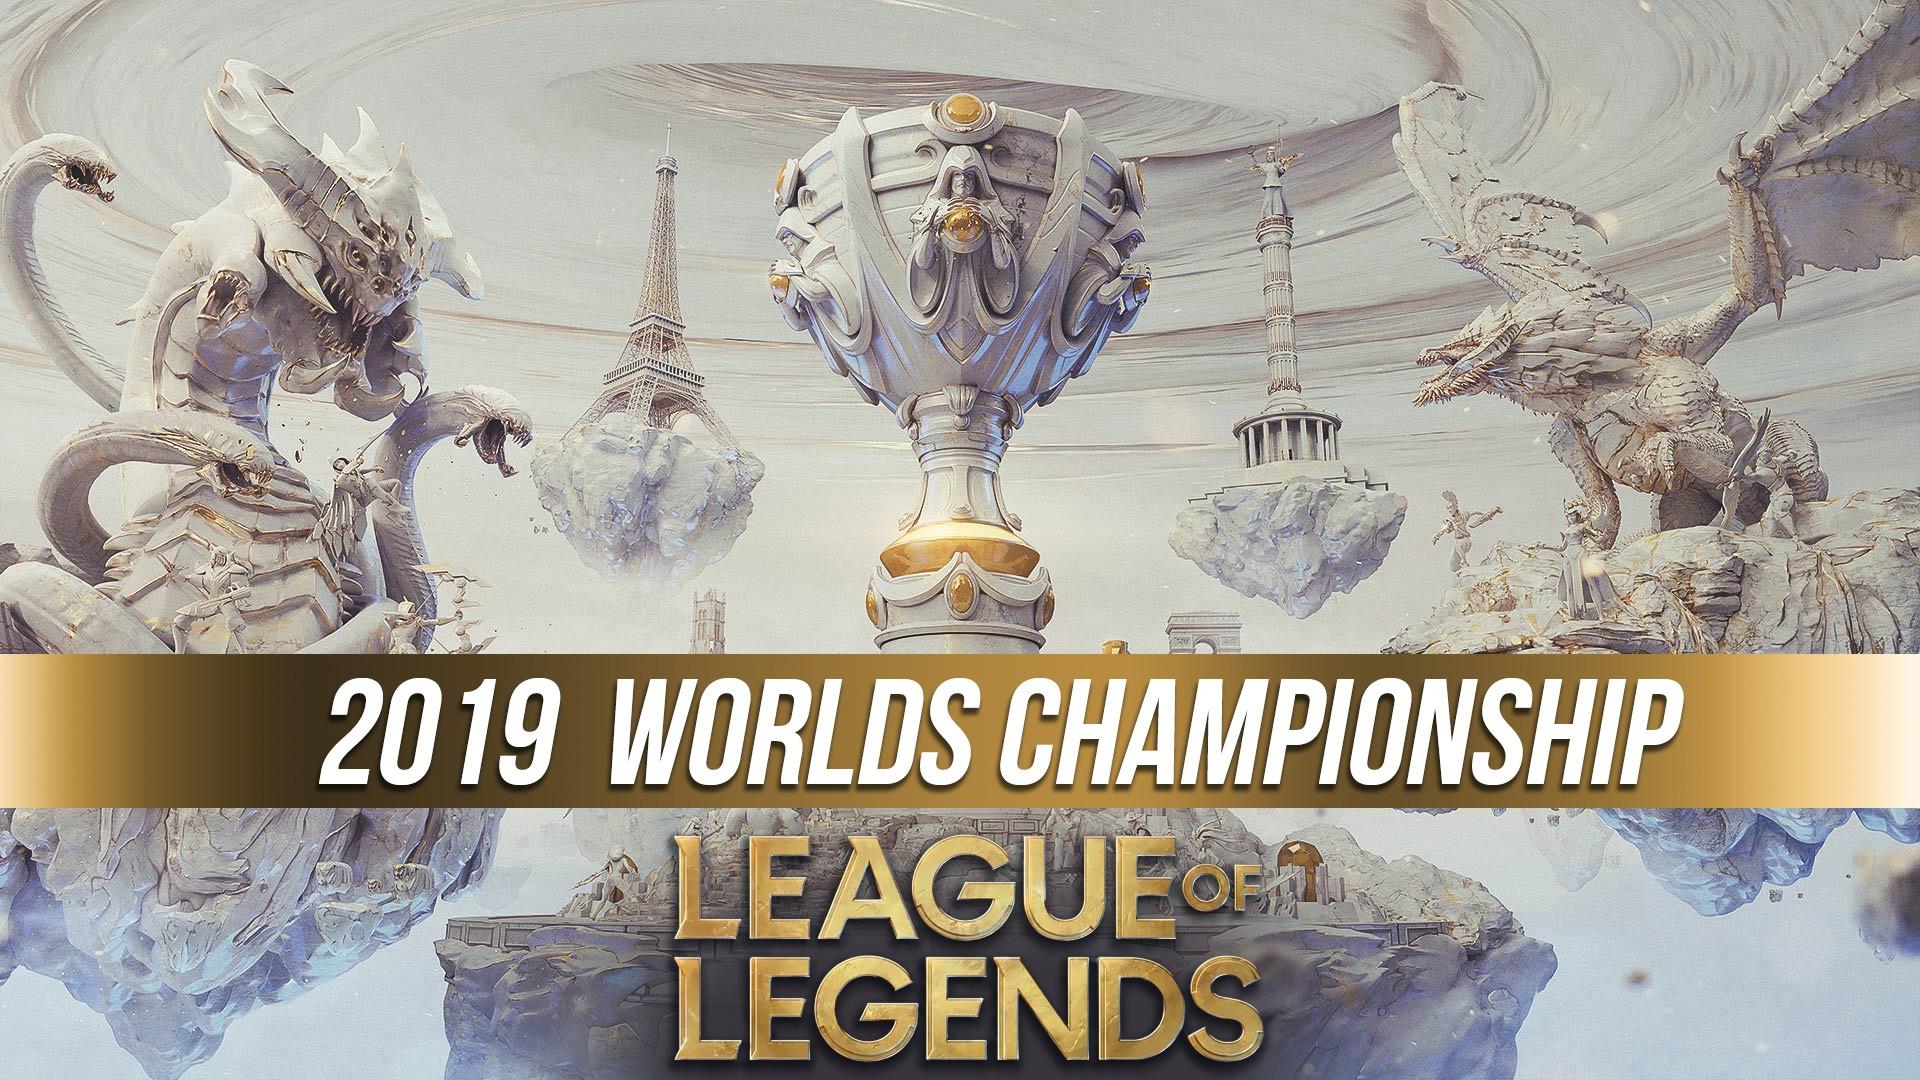 Lol S9 World Championship